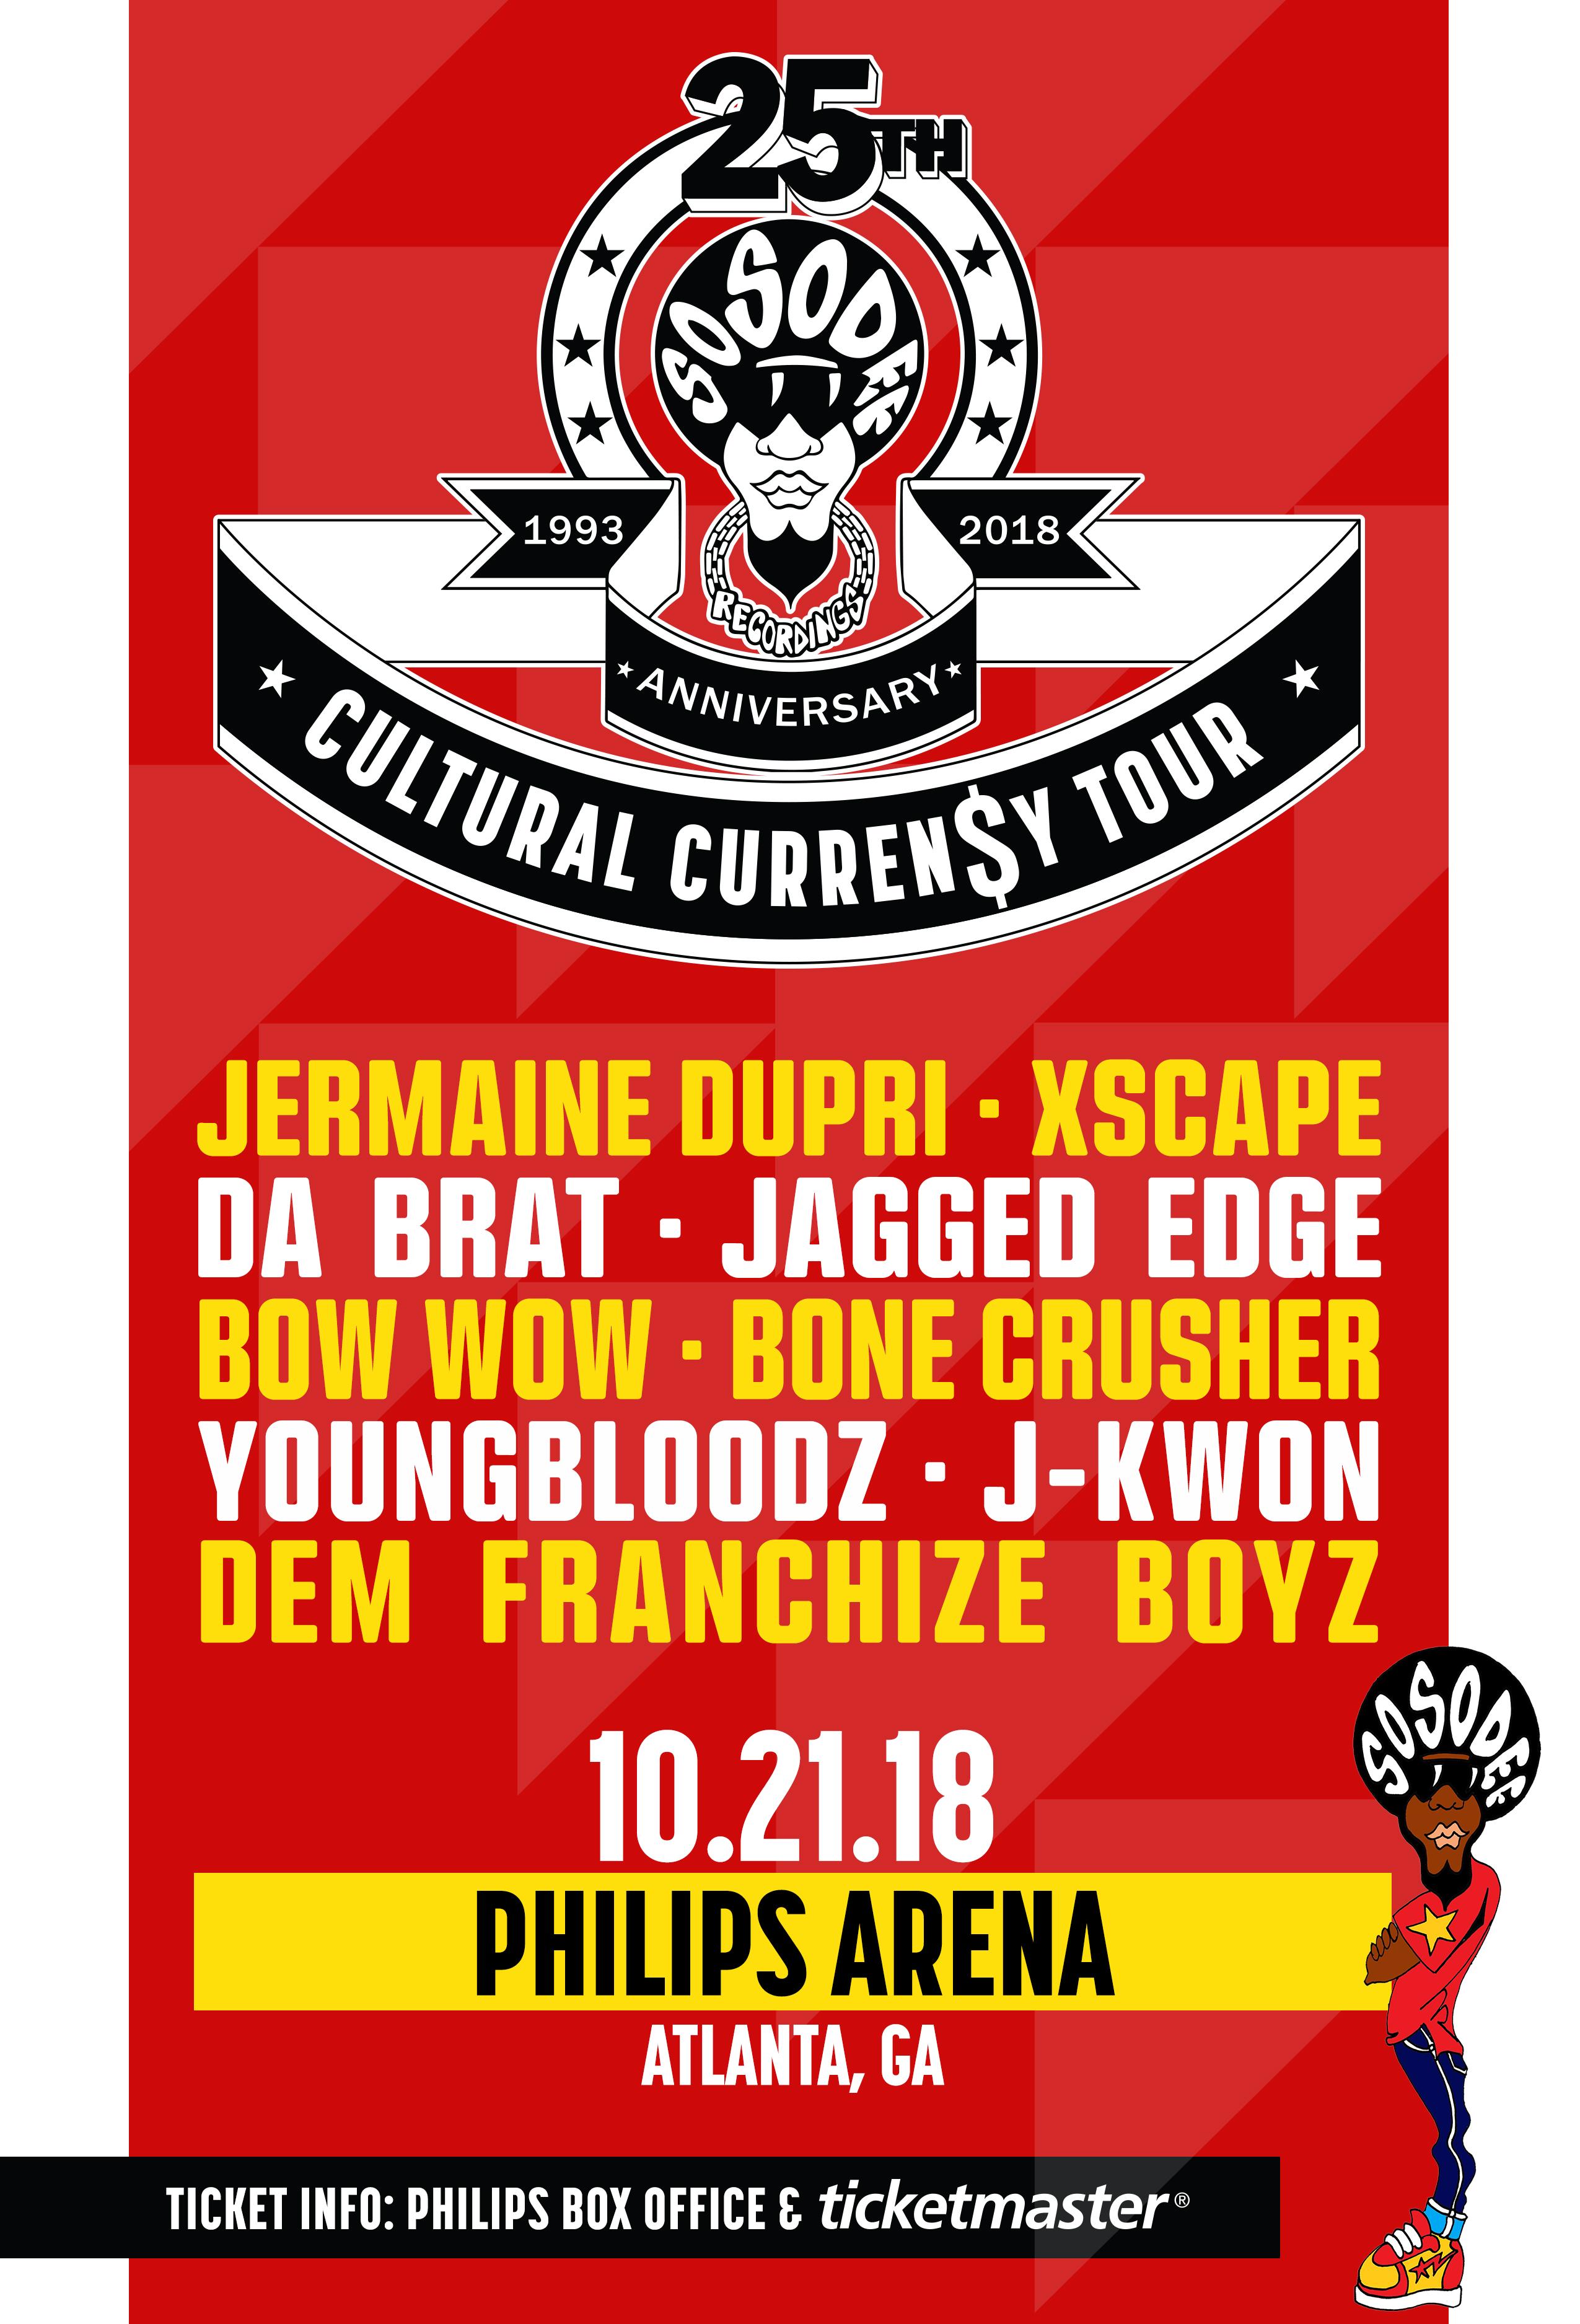 So So Def 25th Cultural Curren$y Tour